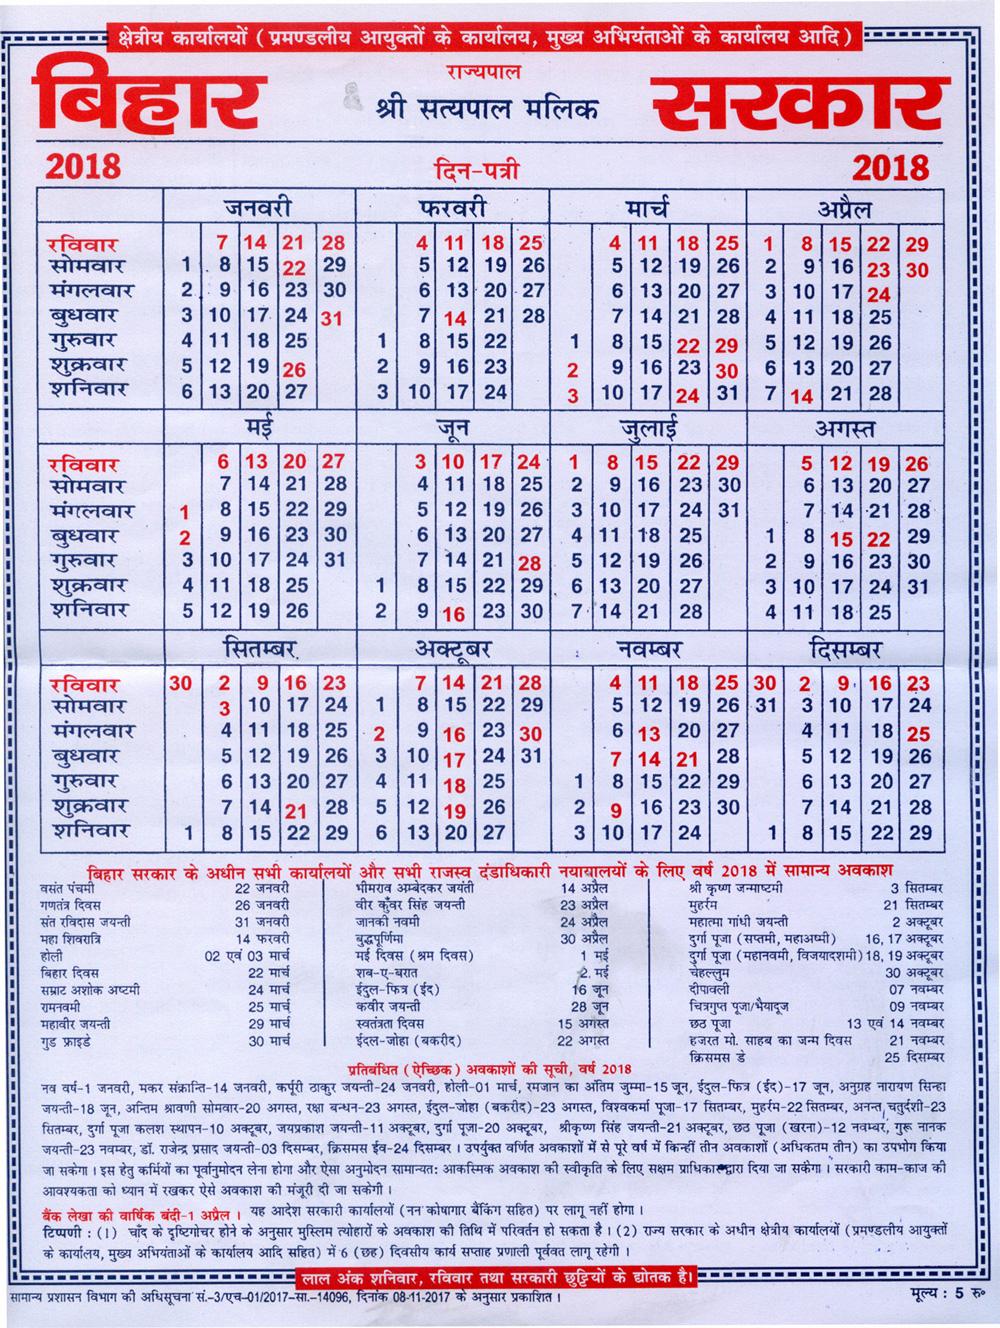 Bihar Govt. Calendar 2018, Bihar Govt. Holiday List, Holiday with regard to Bihar Govt Calender